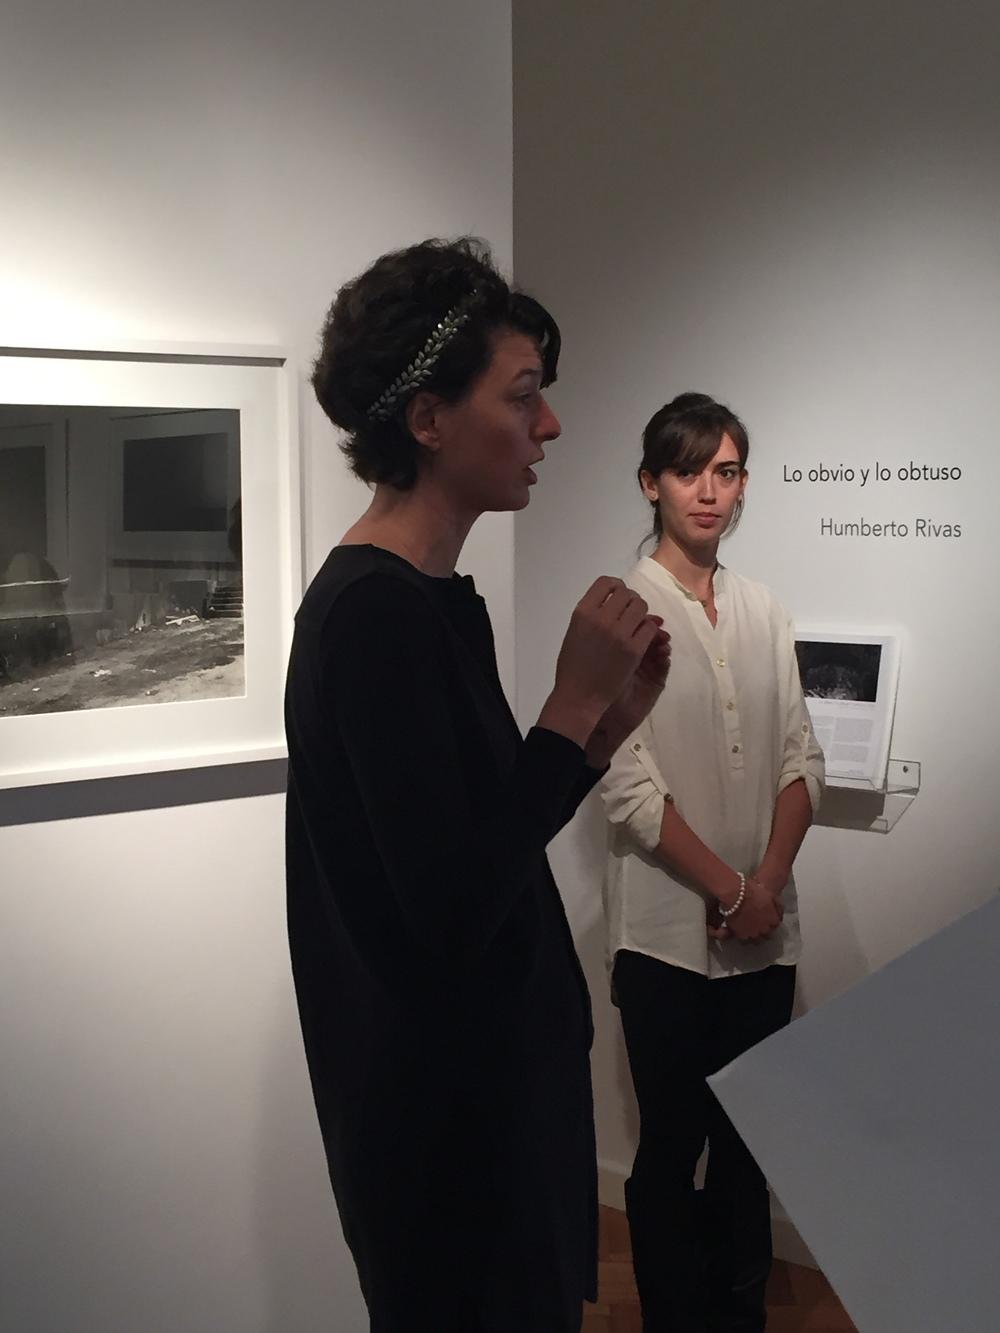 Florencia Giordana Braun and Natasha Slotopolsky of Rolf Art